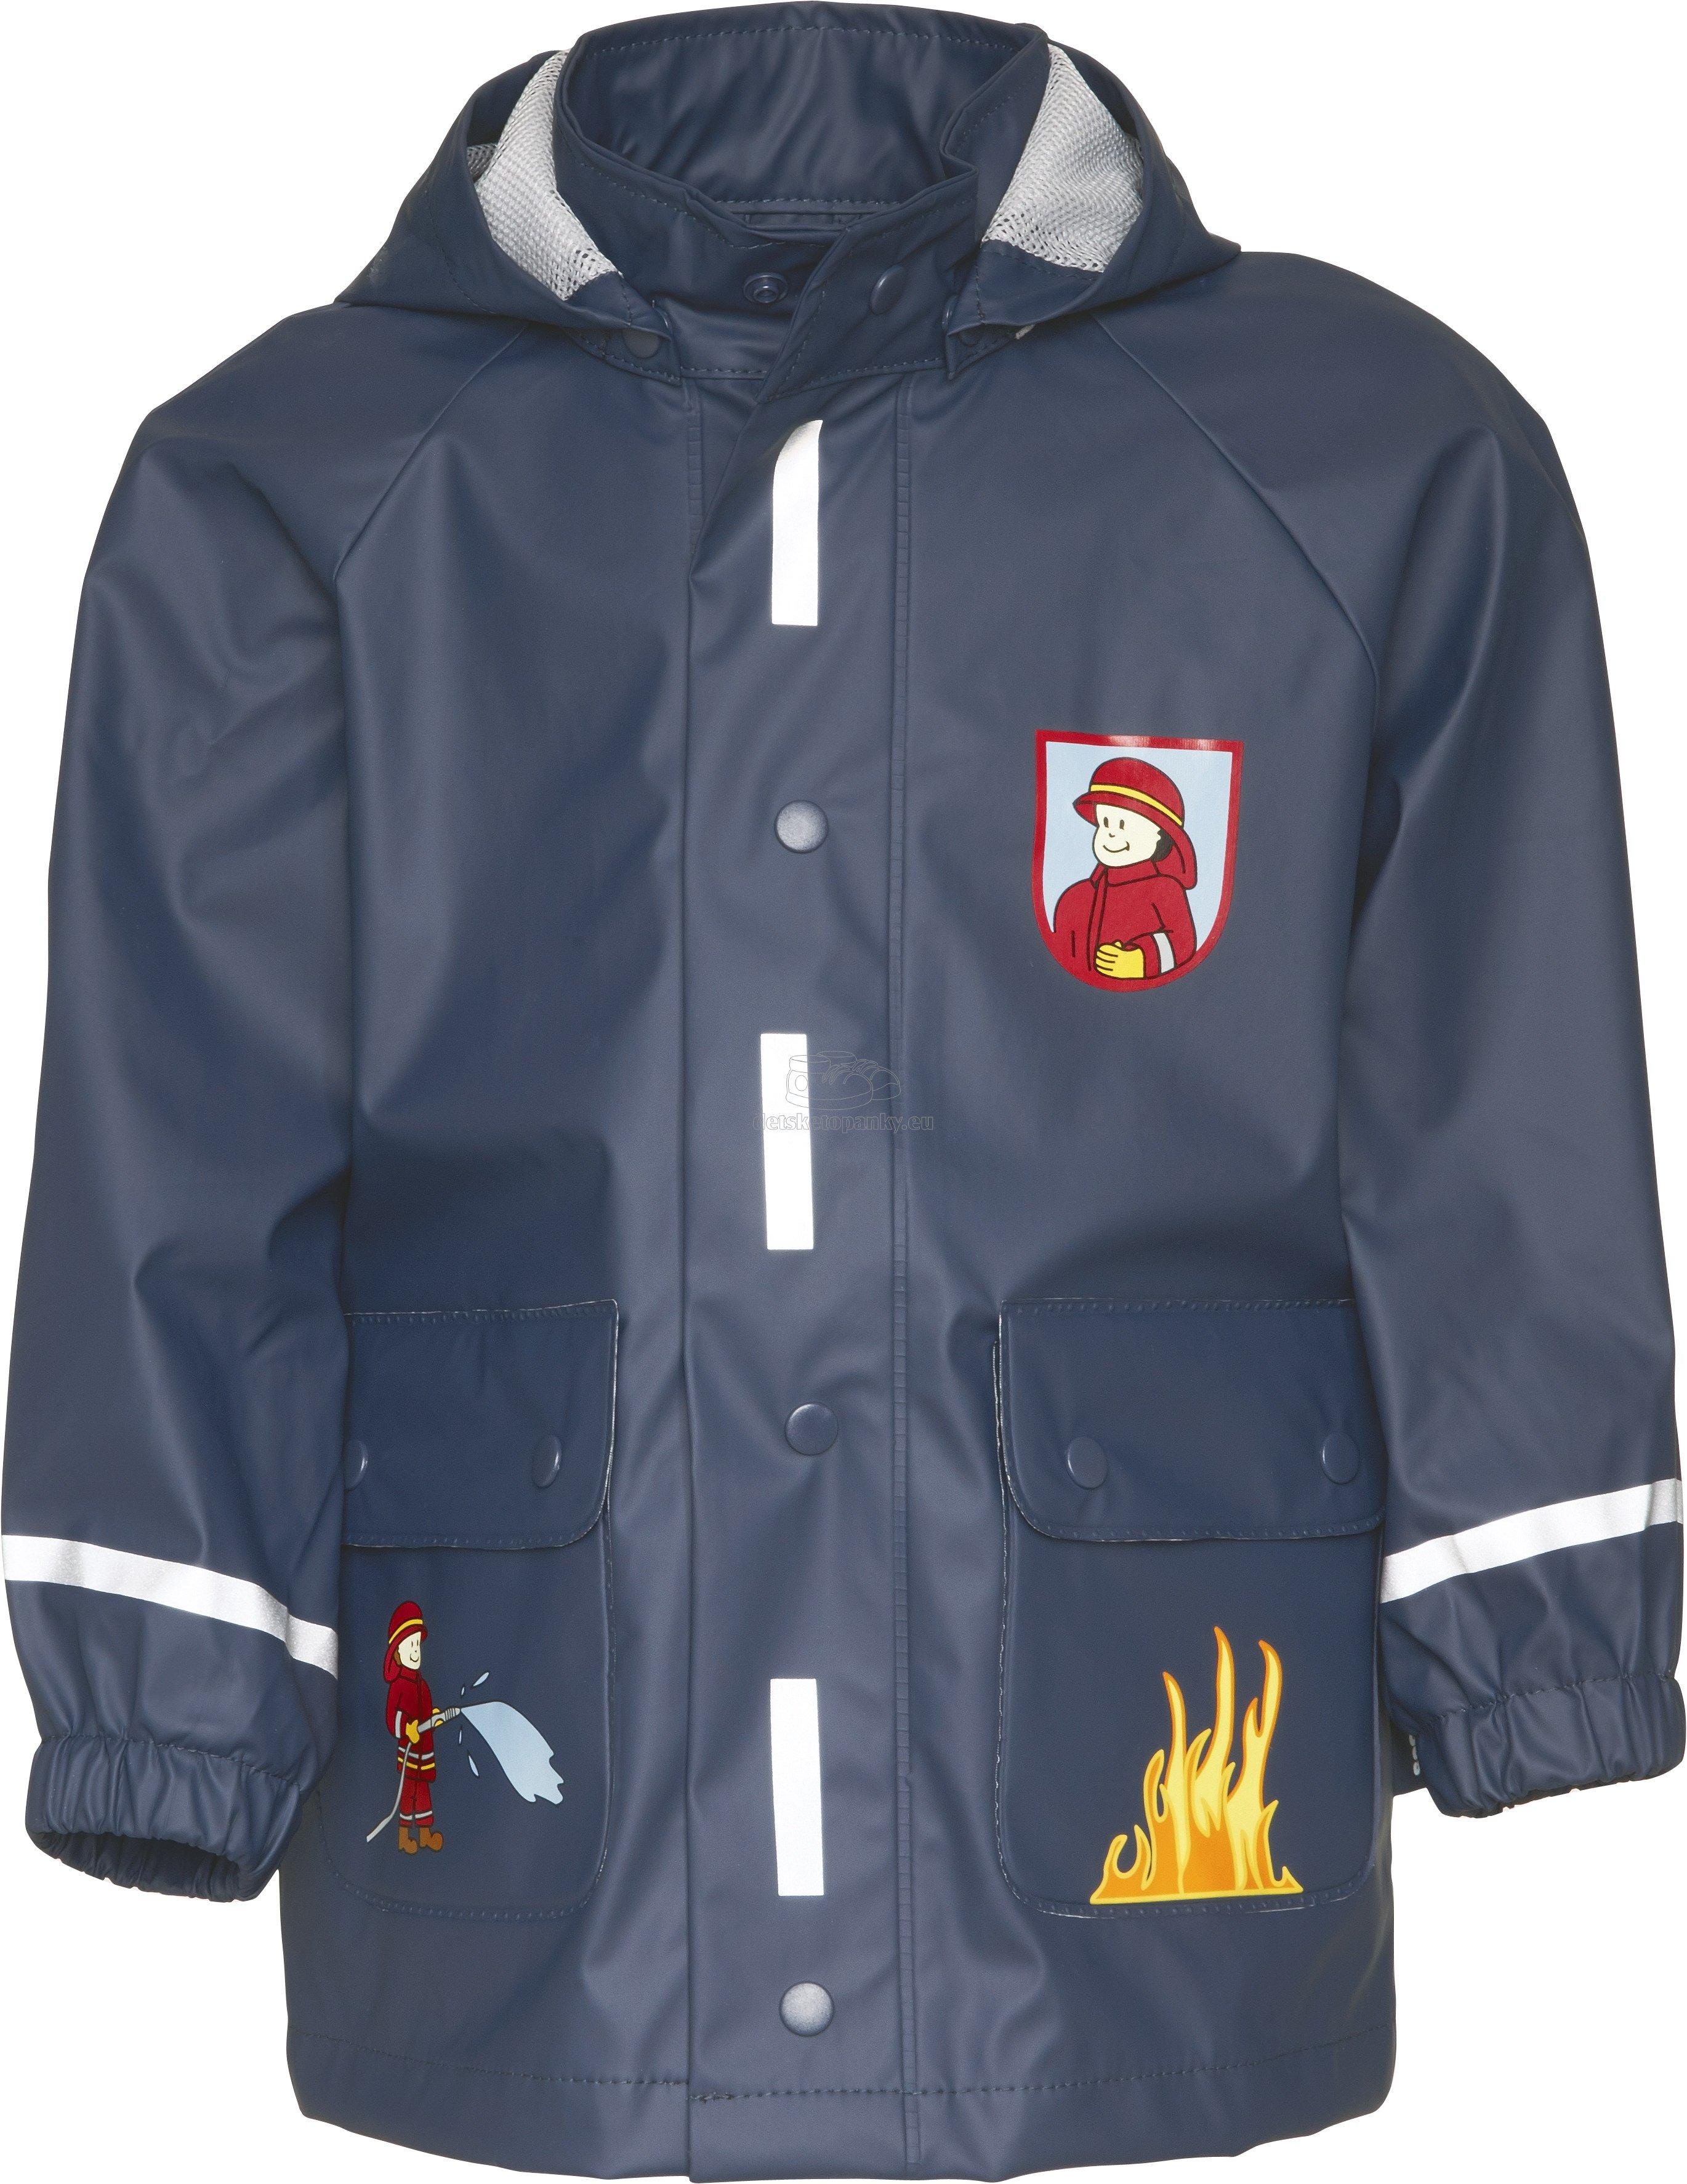 Pláštenka Playshoes 408590 Fire Brigade